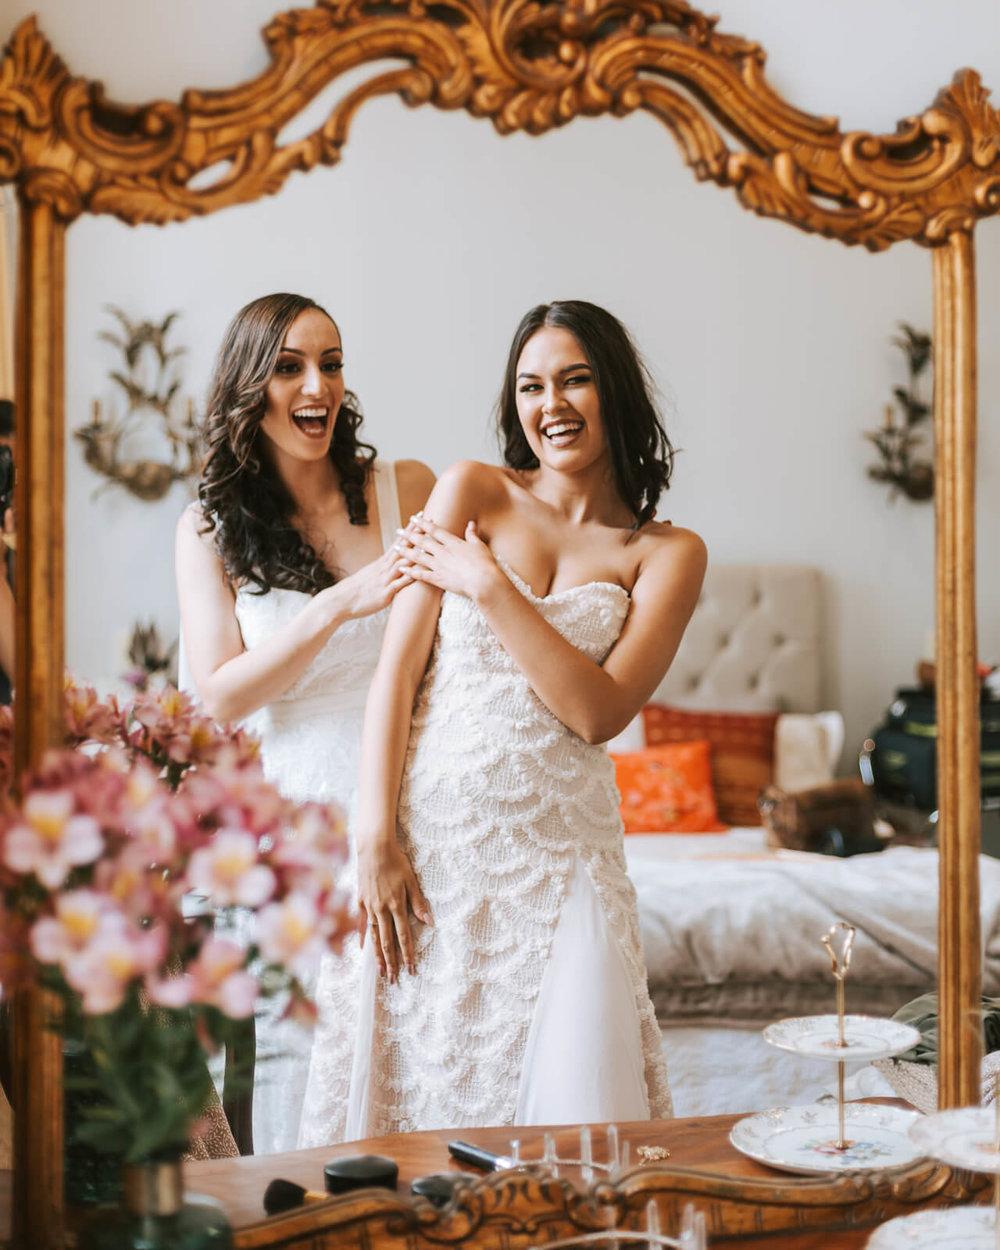 elizabeth may bridal DSC_1284_EmmaSkye.jpg